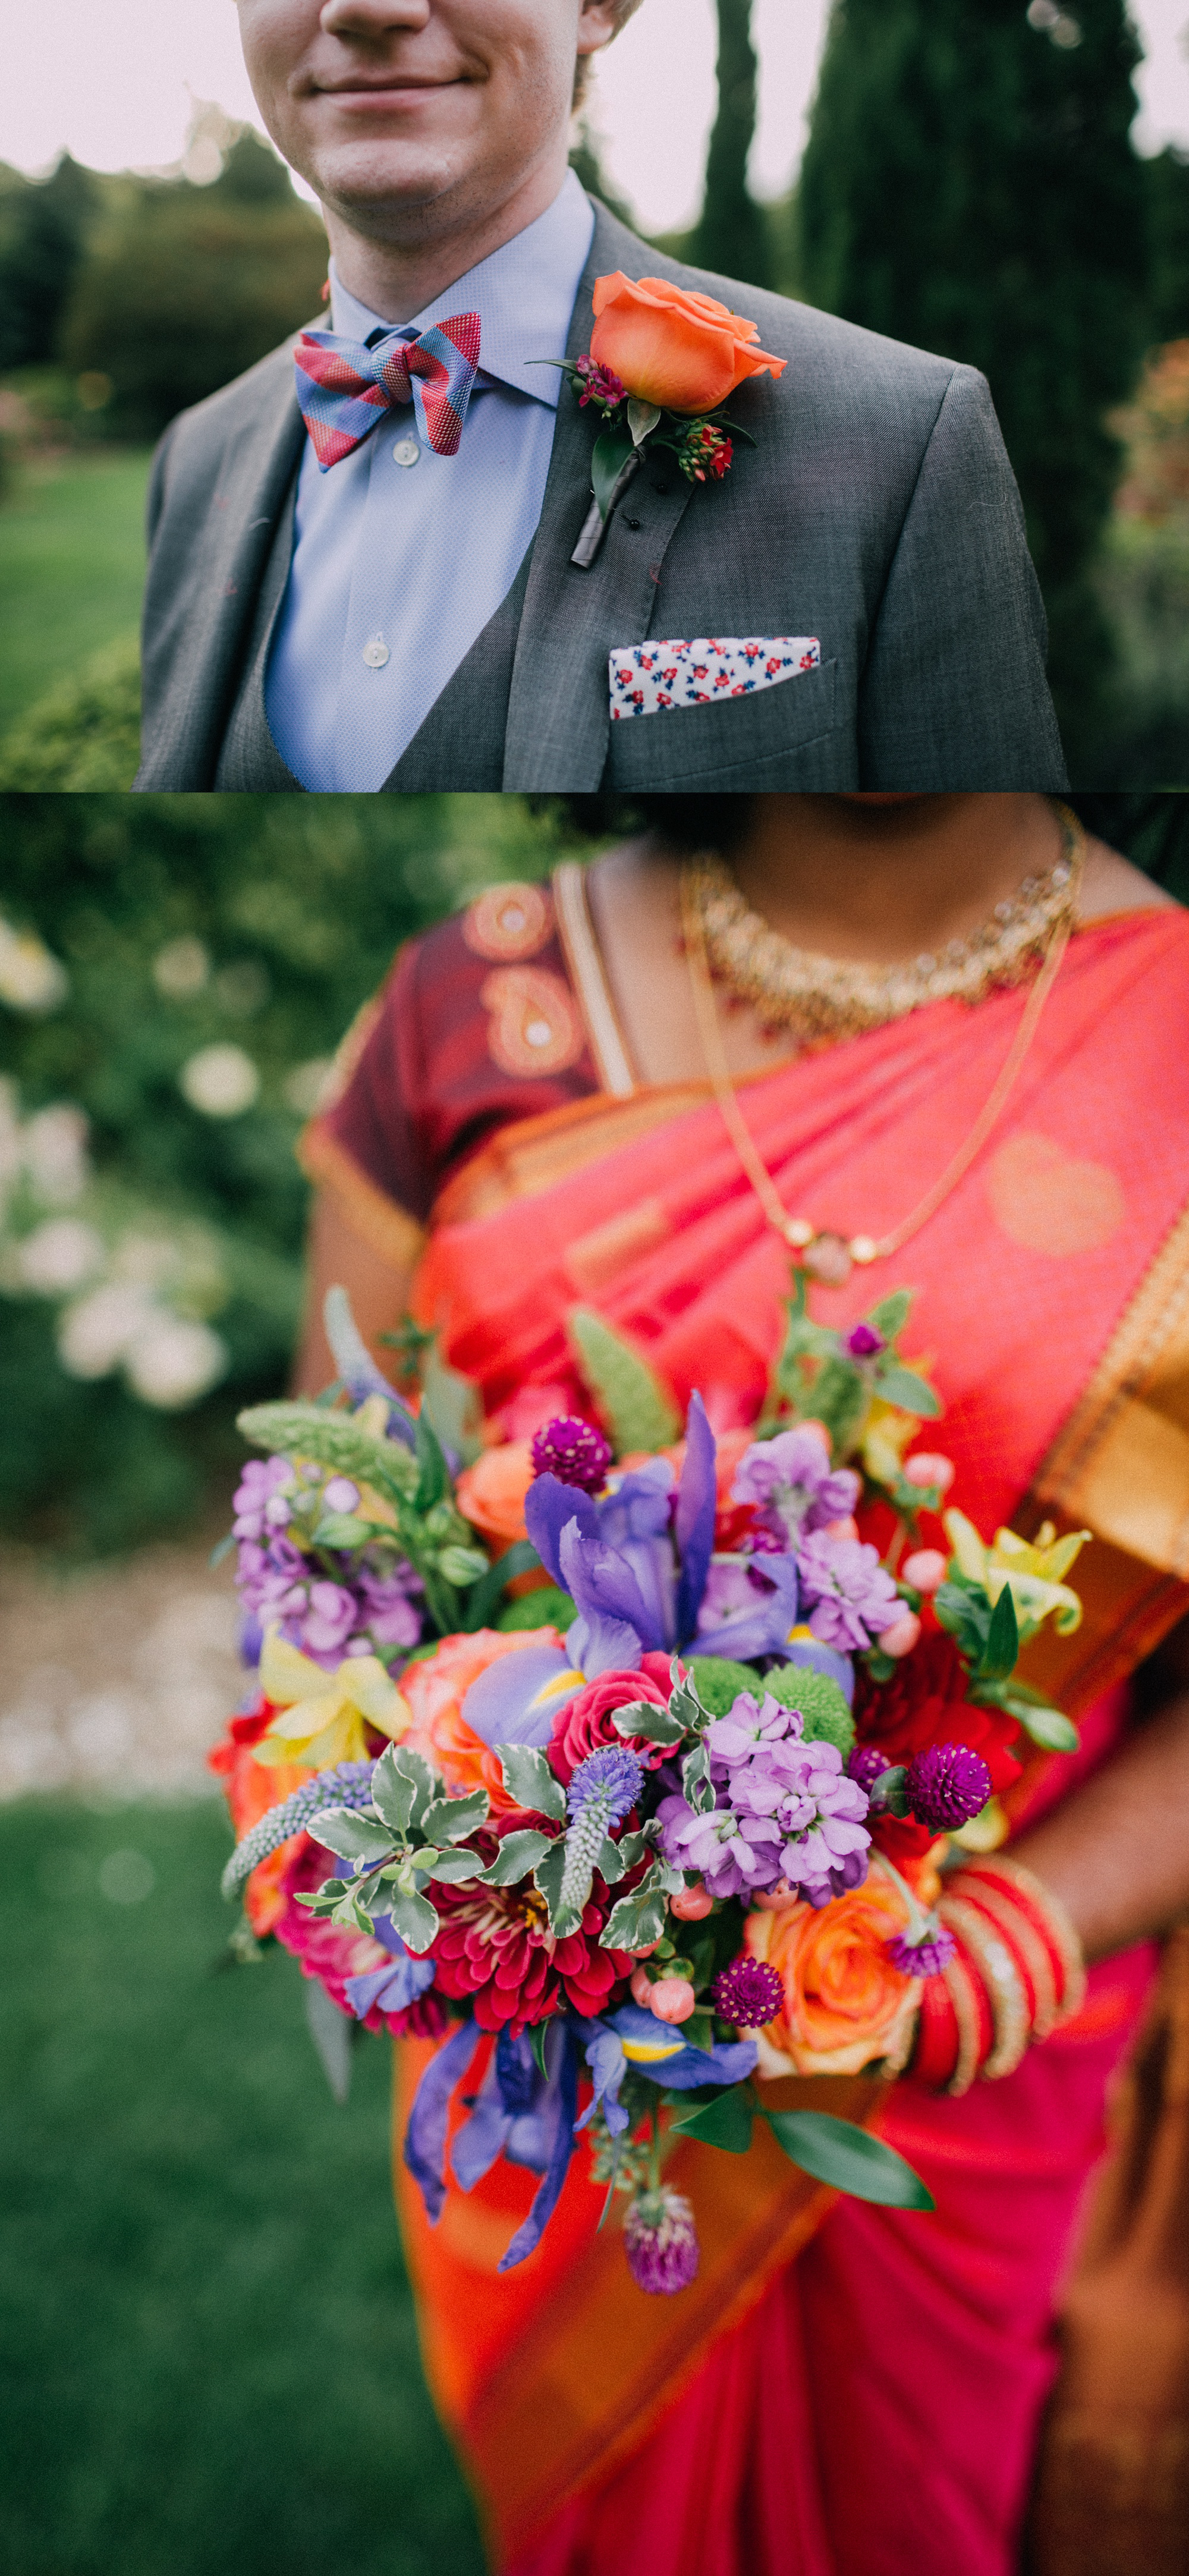 seattle wedding photographer and courthouse elopement photography washington -8.jpg